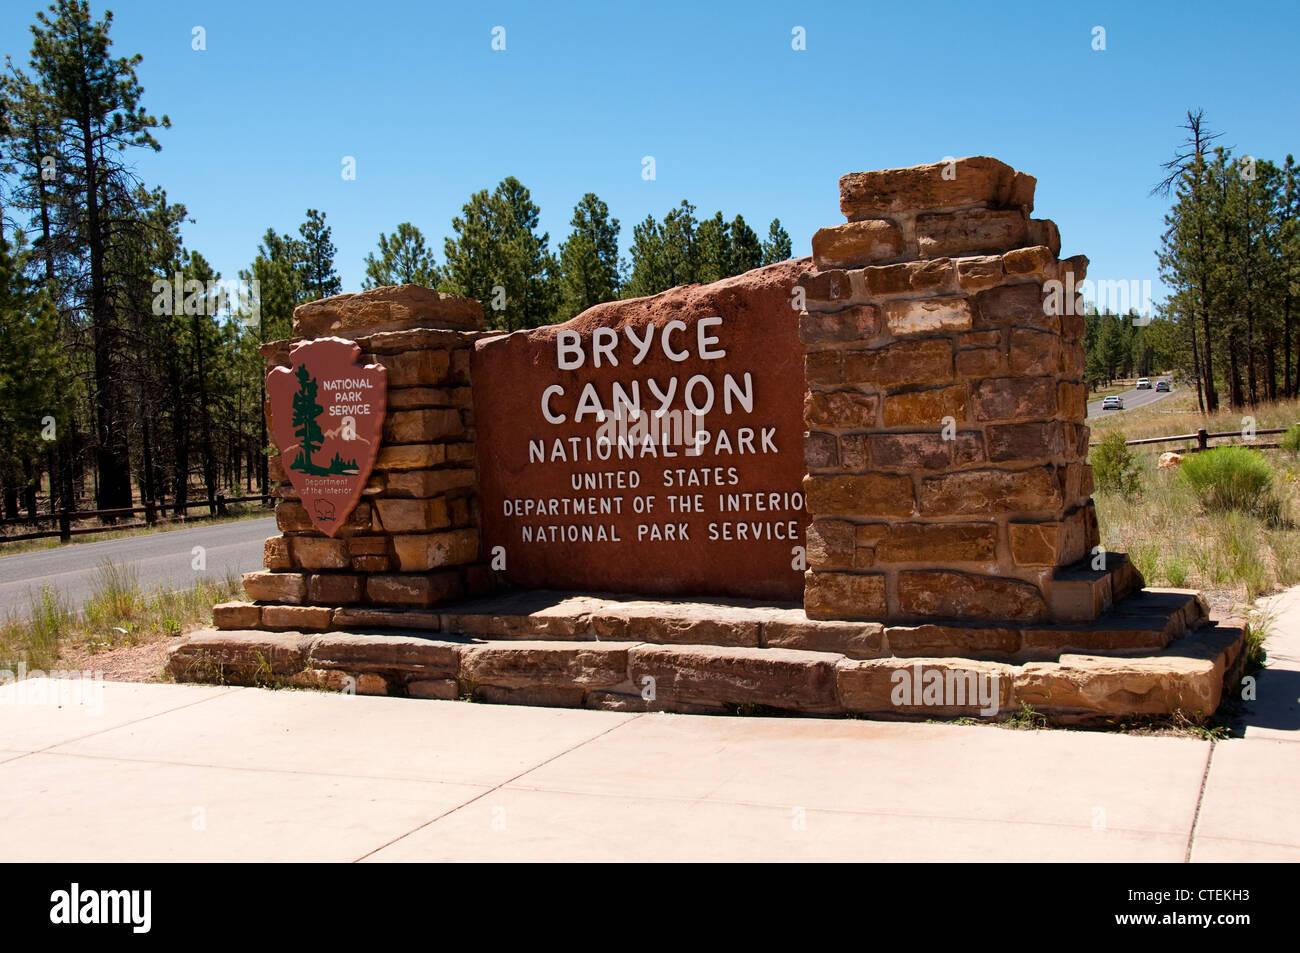 USA, Utah, Park Service signage presenting Bryce Canyon National Park. - Stock Image